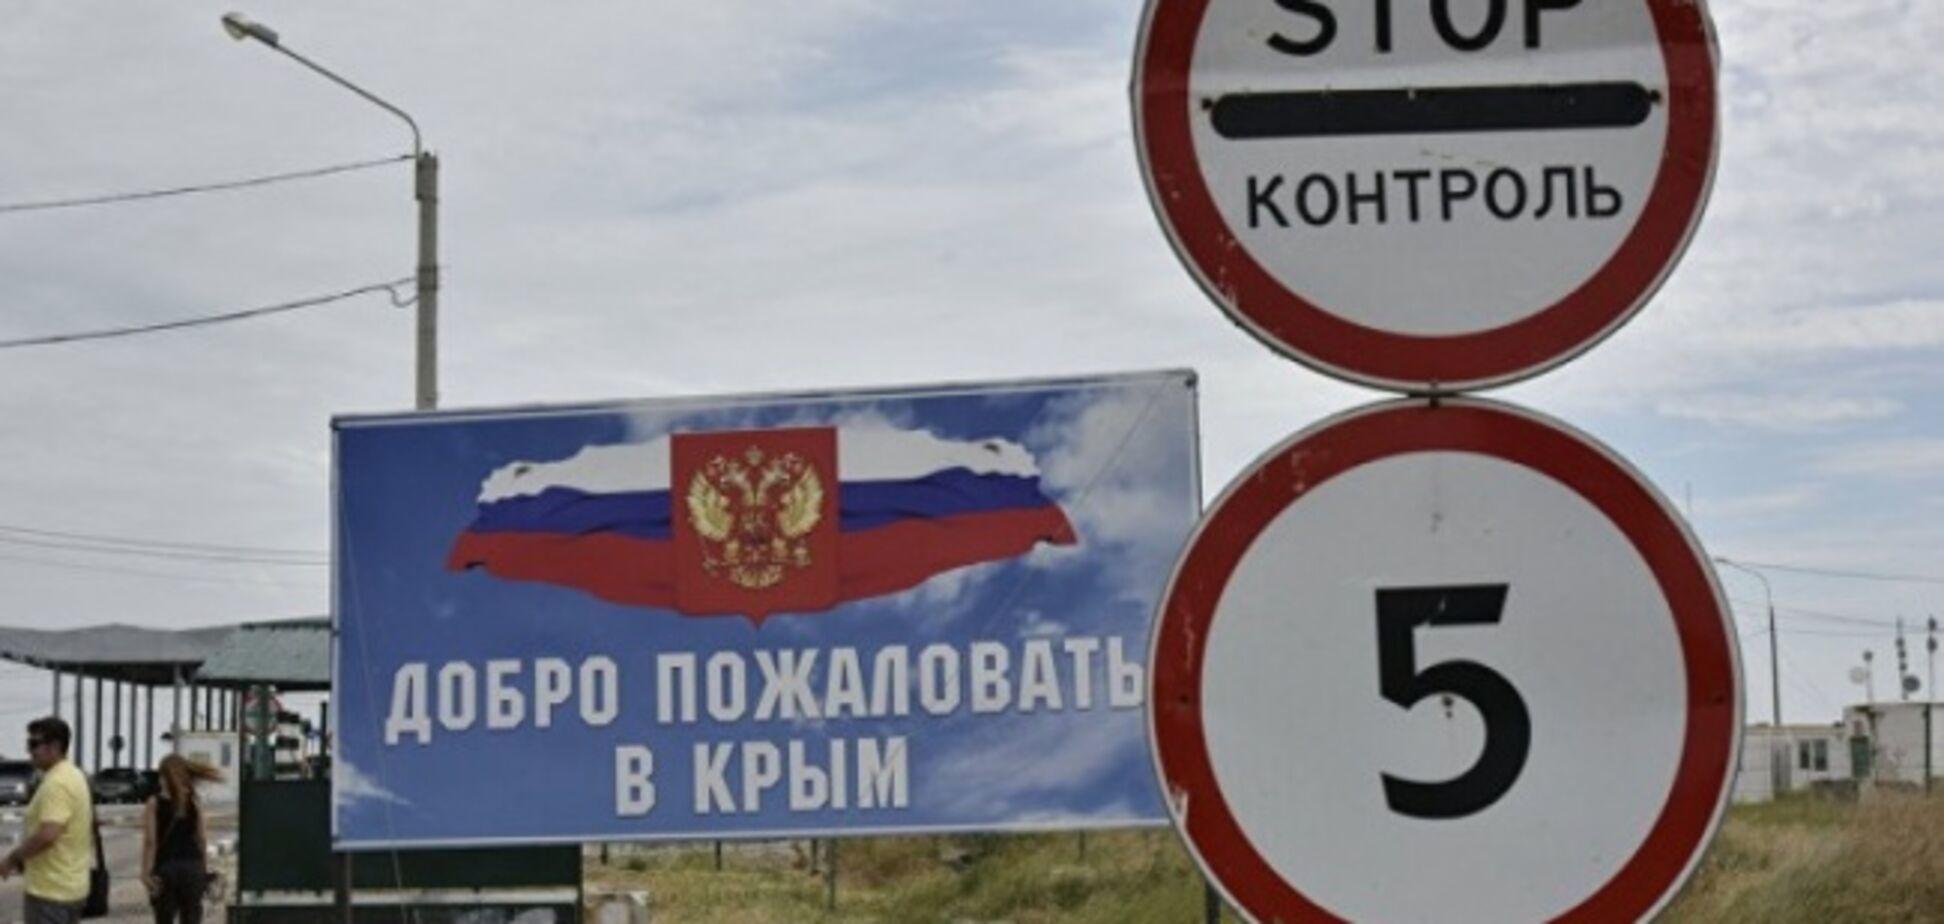 Працюють у Криму: окупанти 'здали' українських вчених